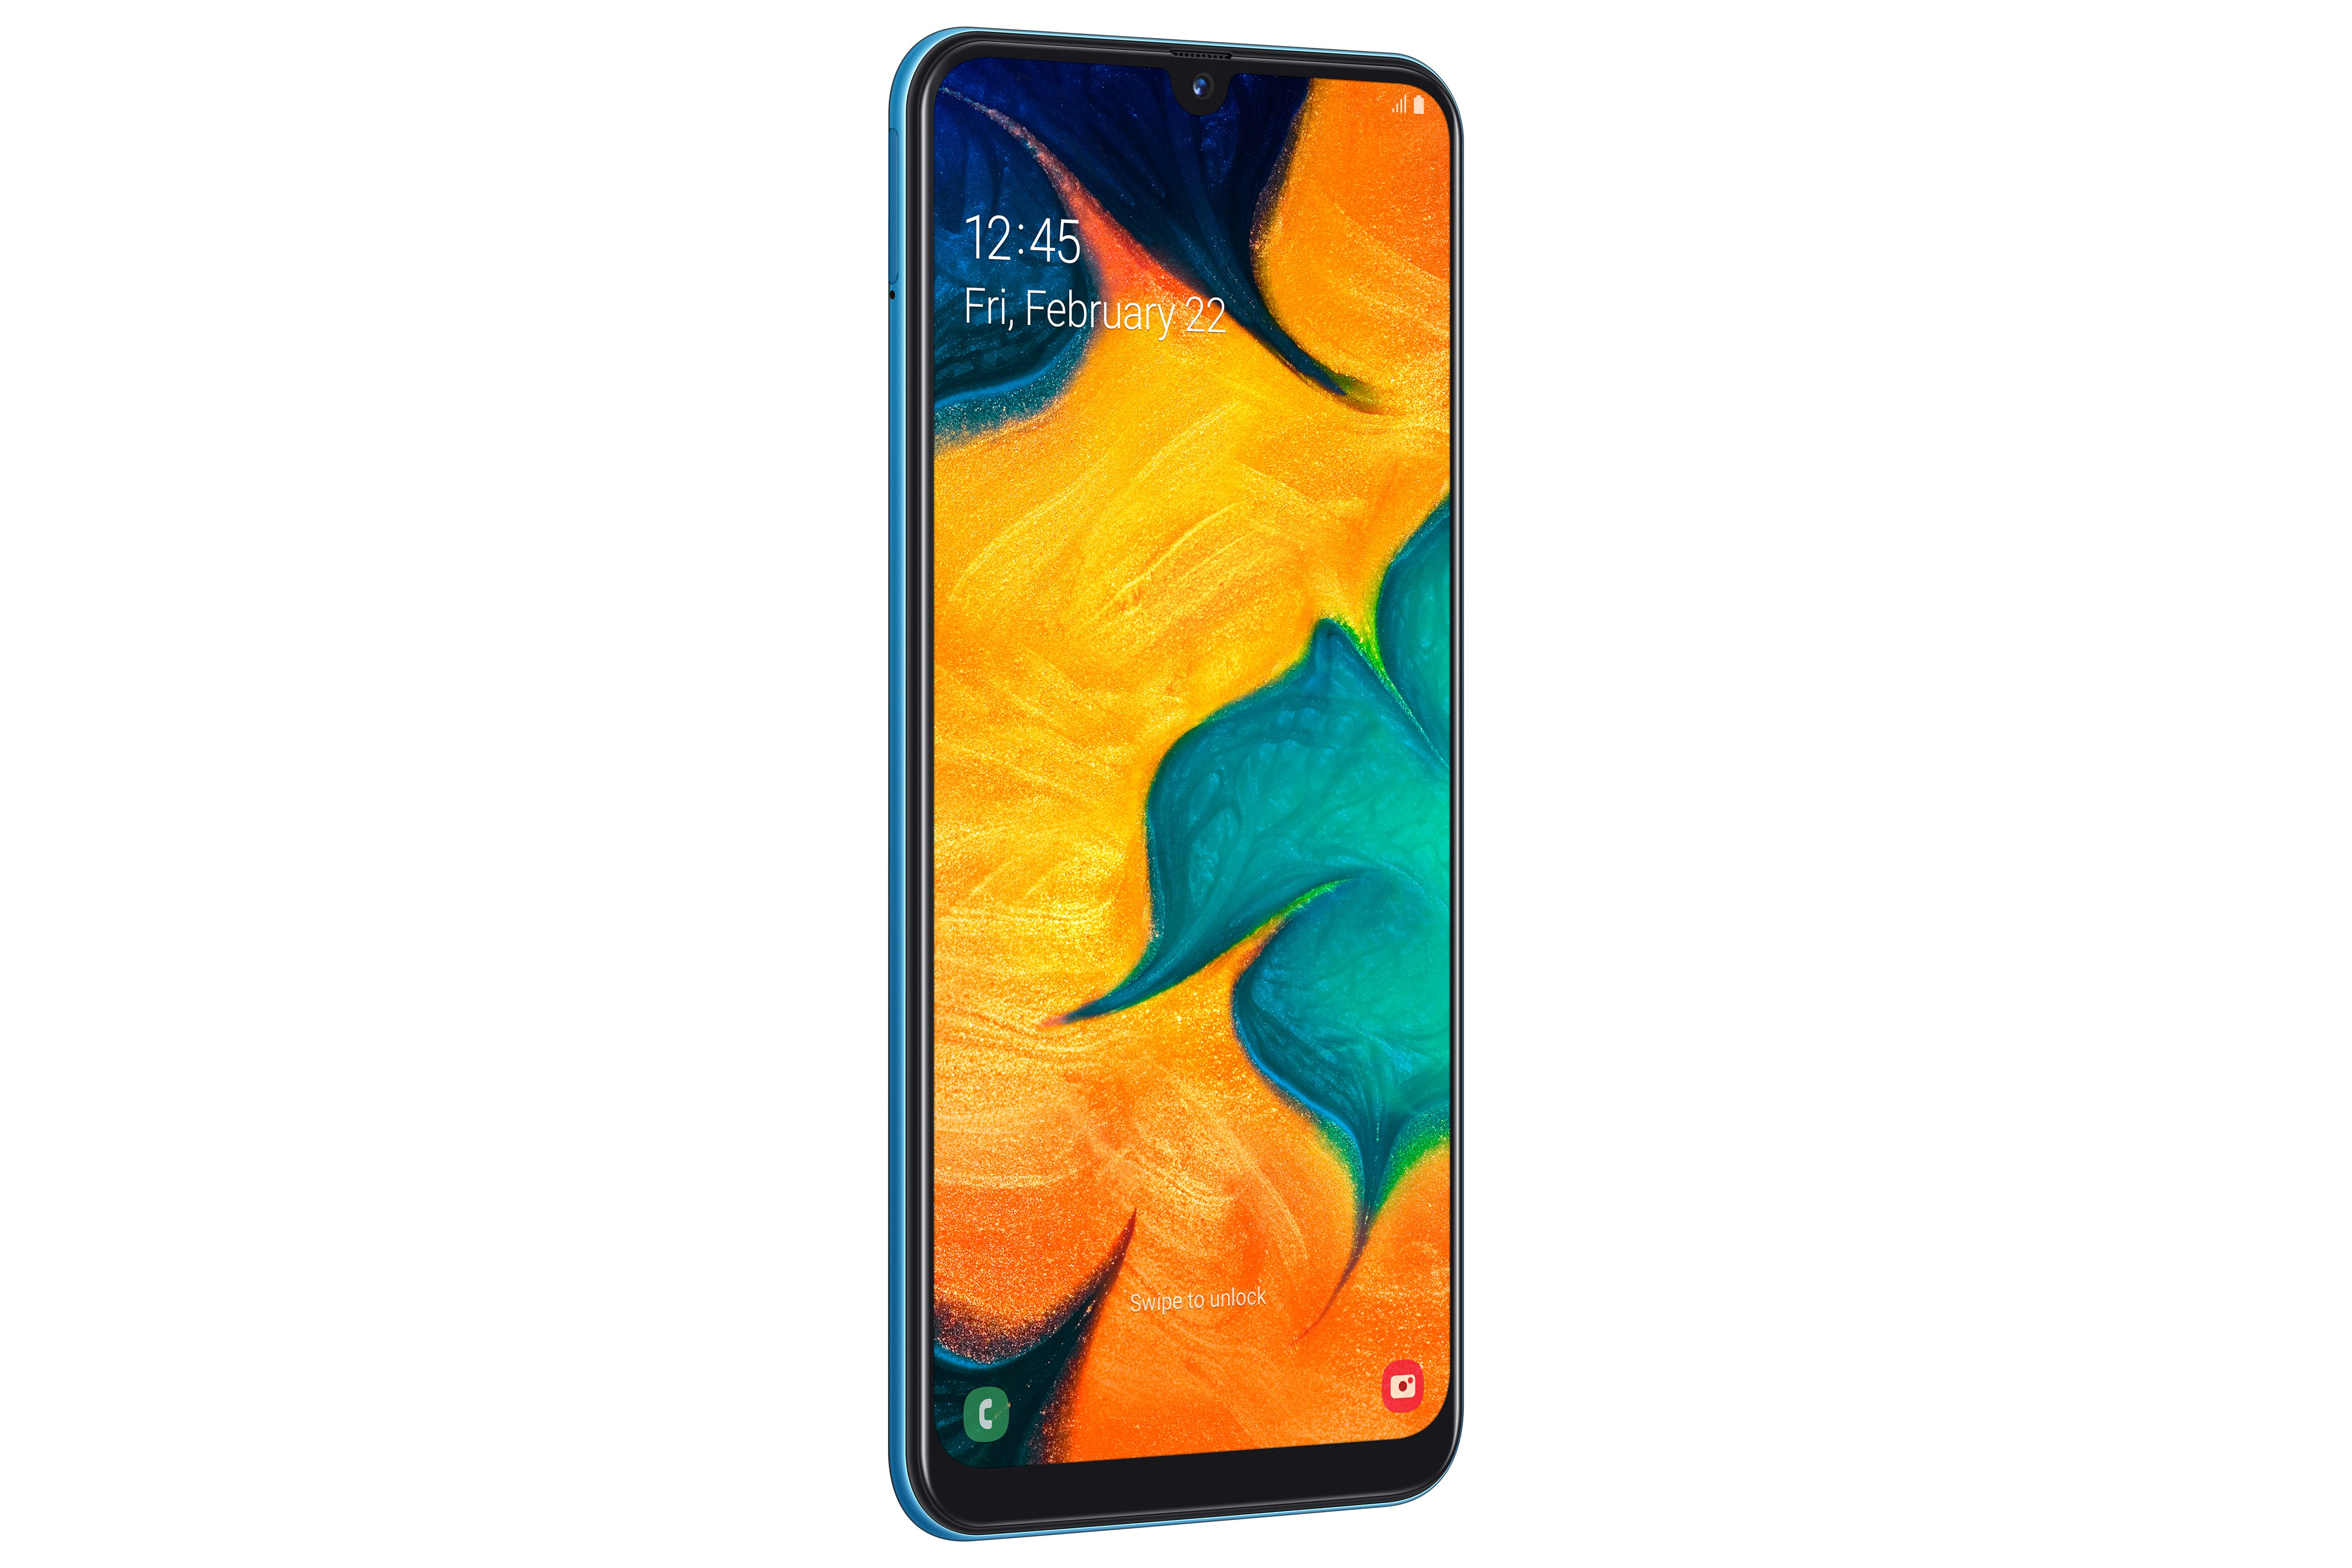 2deef8af1b198 Samsung Galaxy A30 2019 64 GB (Samsung Türkiye Garantili) Fiyatı